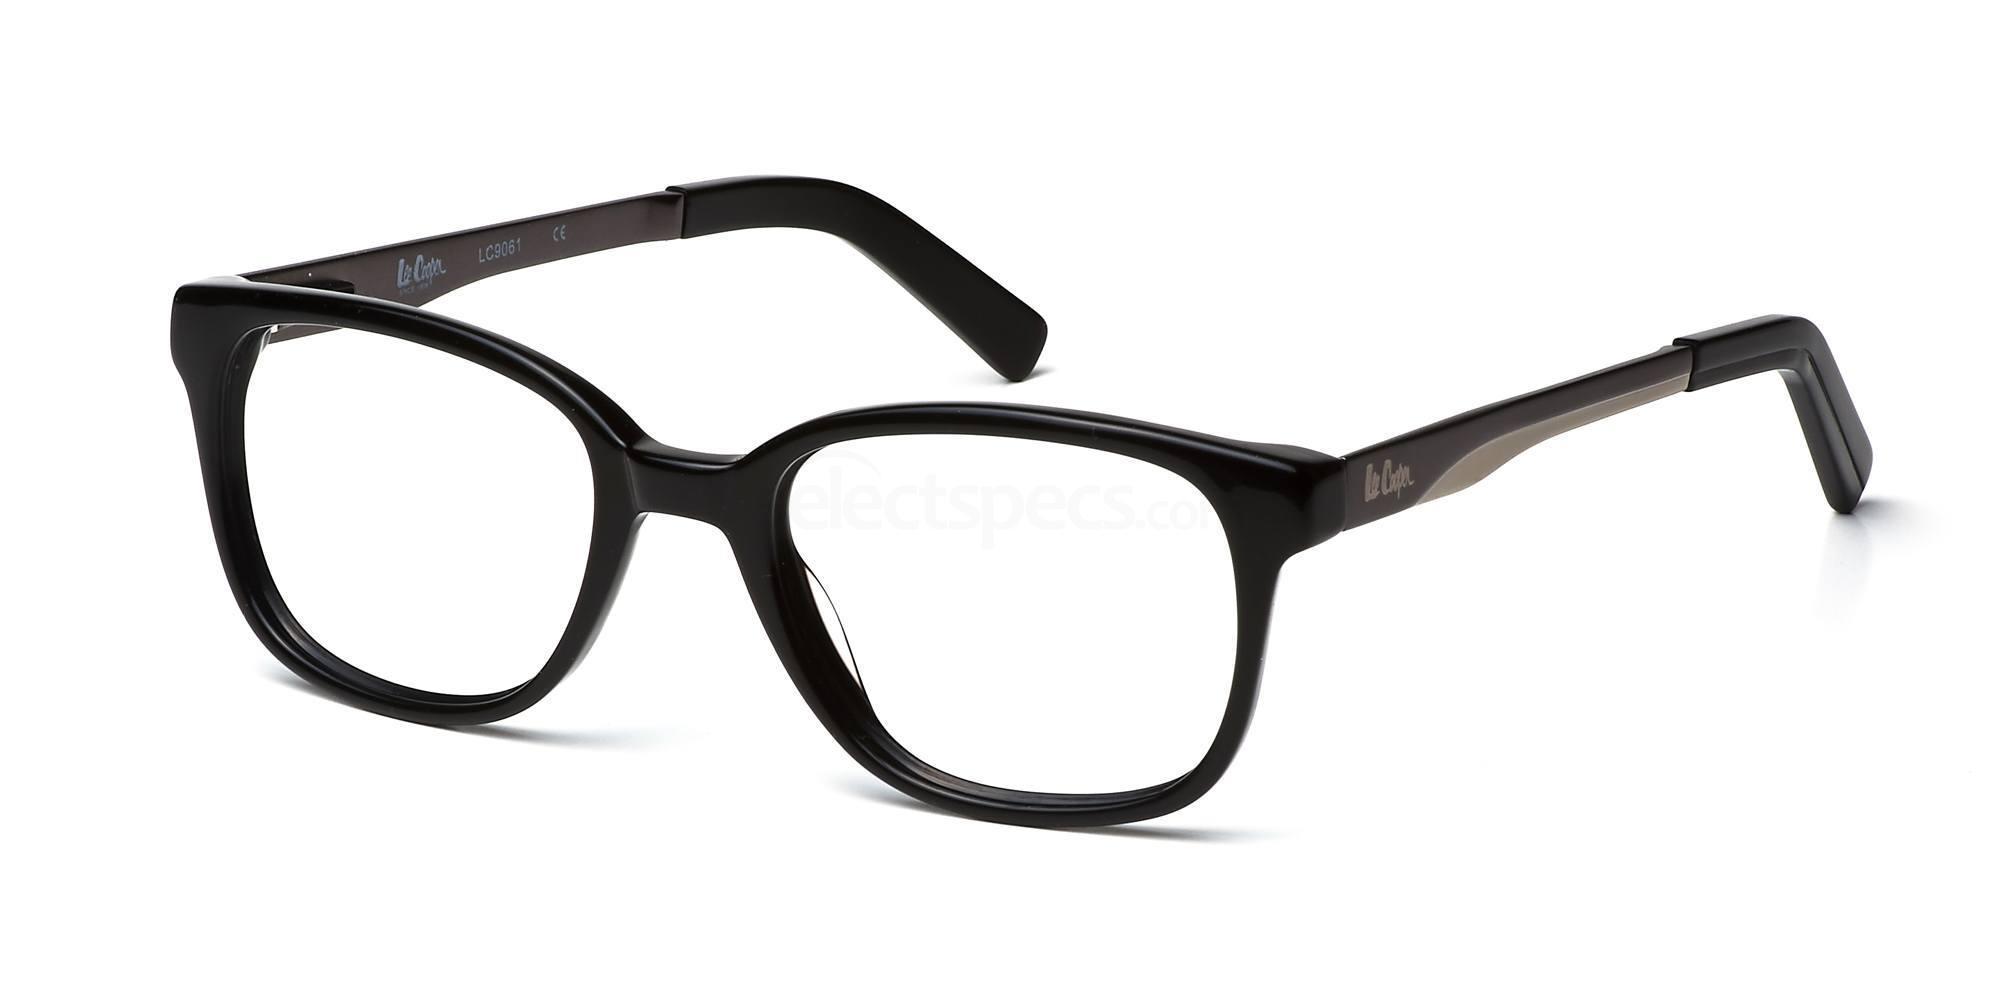 2000x1000 Lee Cooper Lc 9061 Glasses Free Lenses Selectspecs